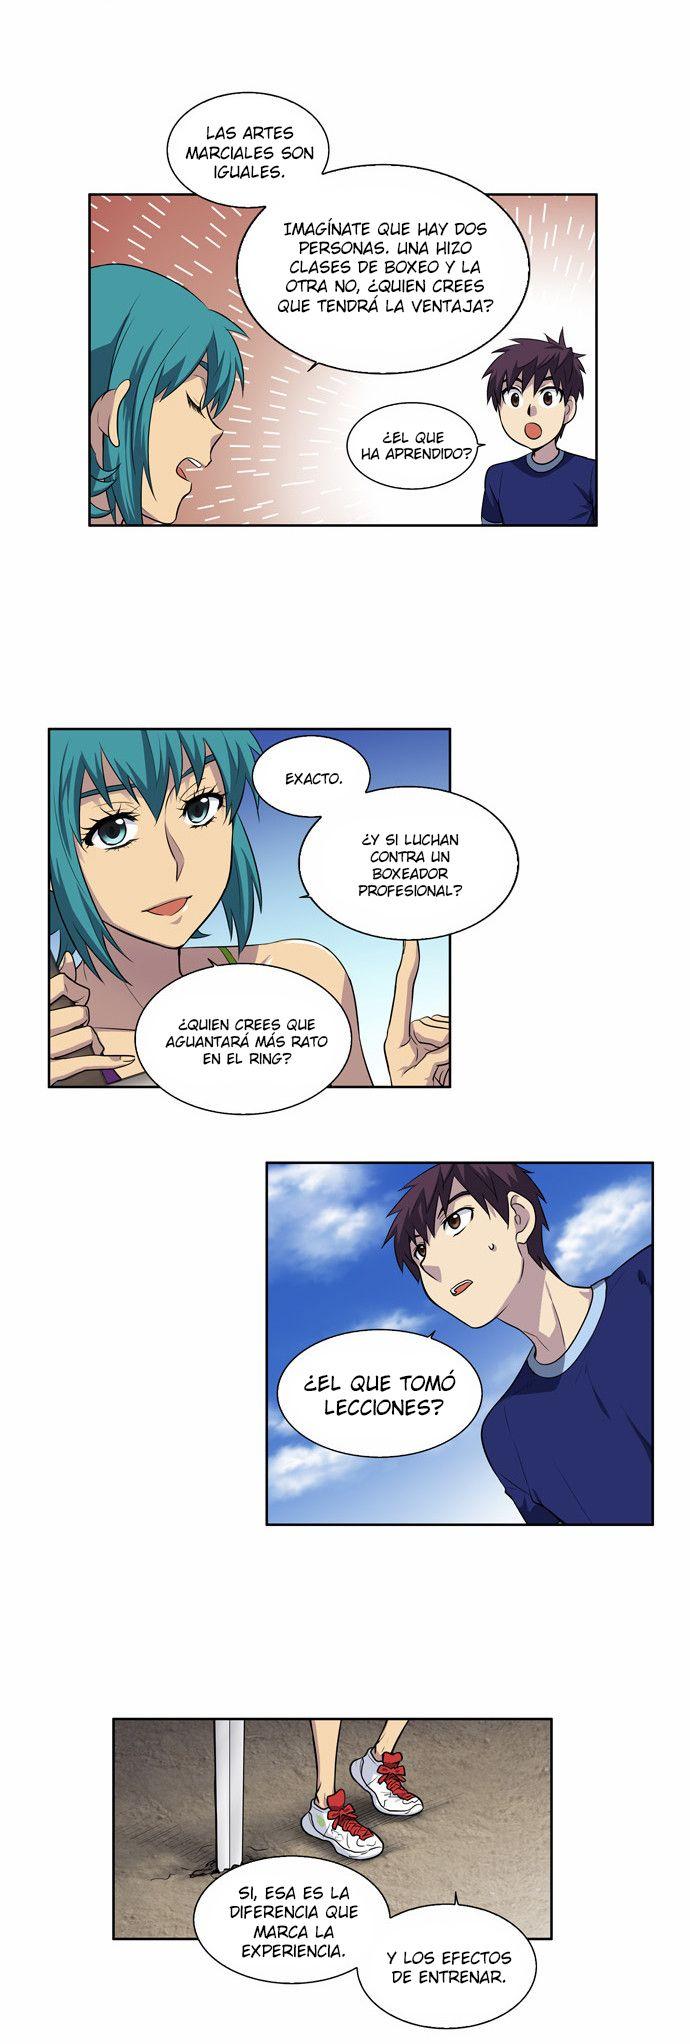 https://c5.ninemanga.com/es_manga/61/1725/464211/62dbdc10715d73b9fbbfdcda0a88848d.jpg Page 7